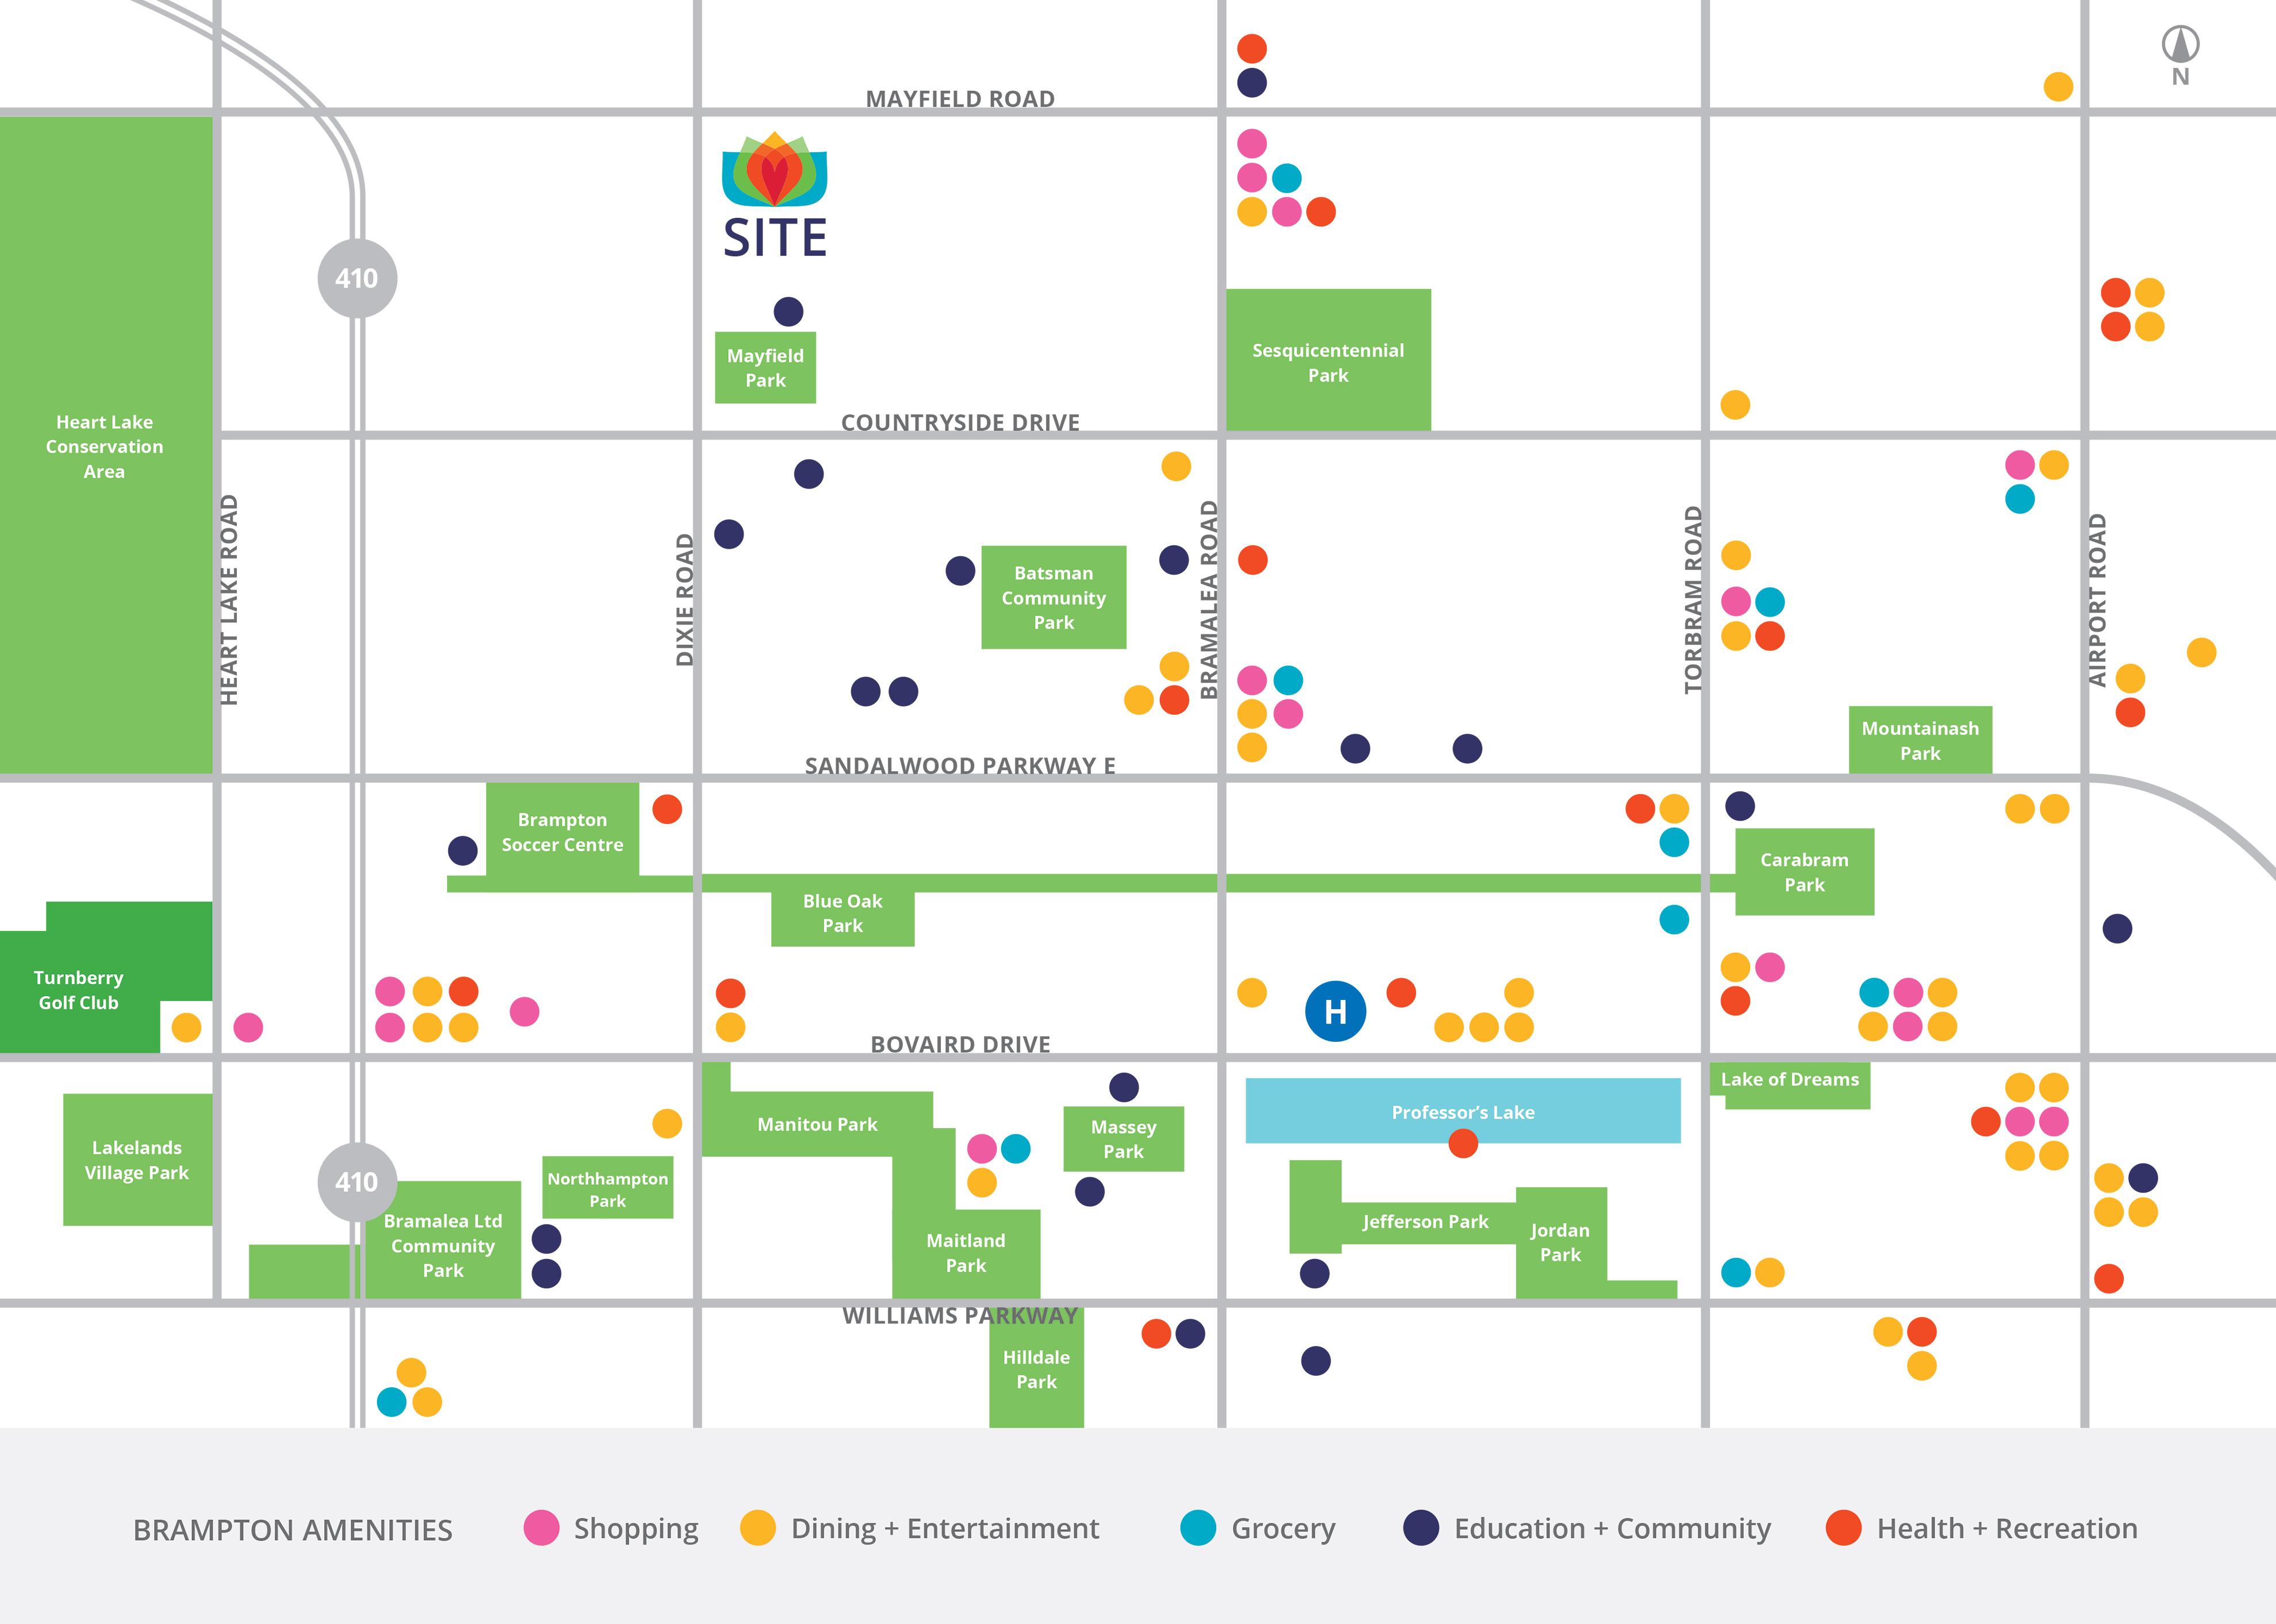 Mayfield Village Amenities Map